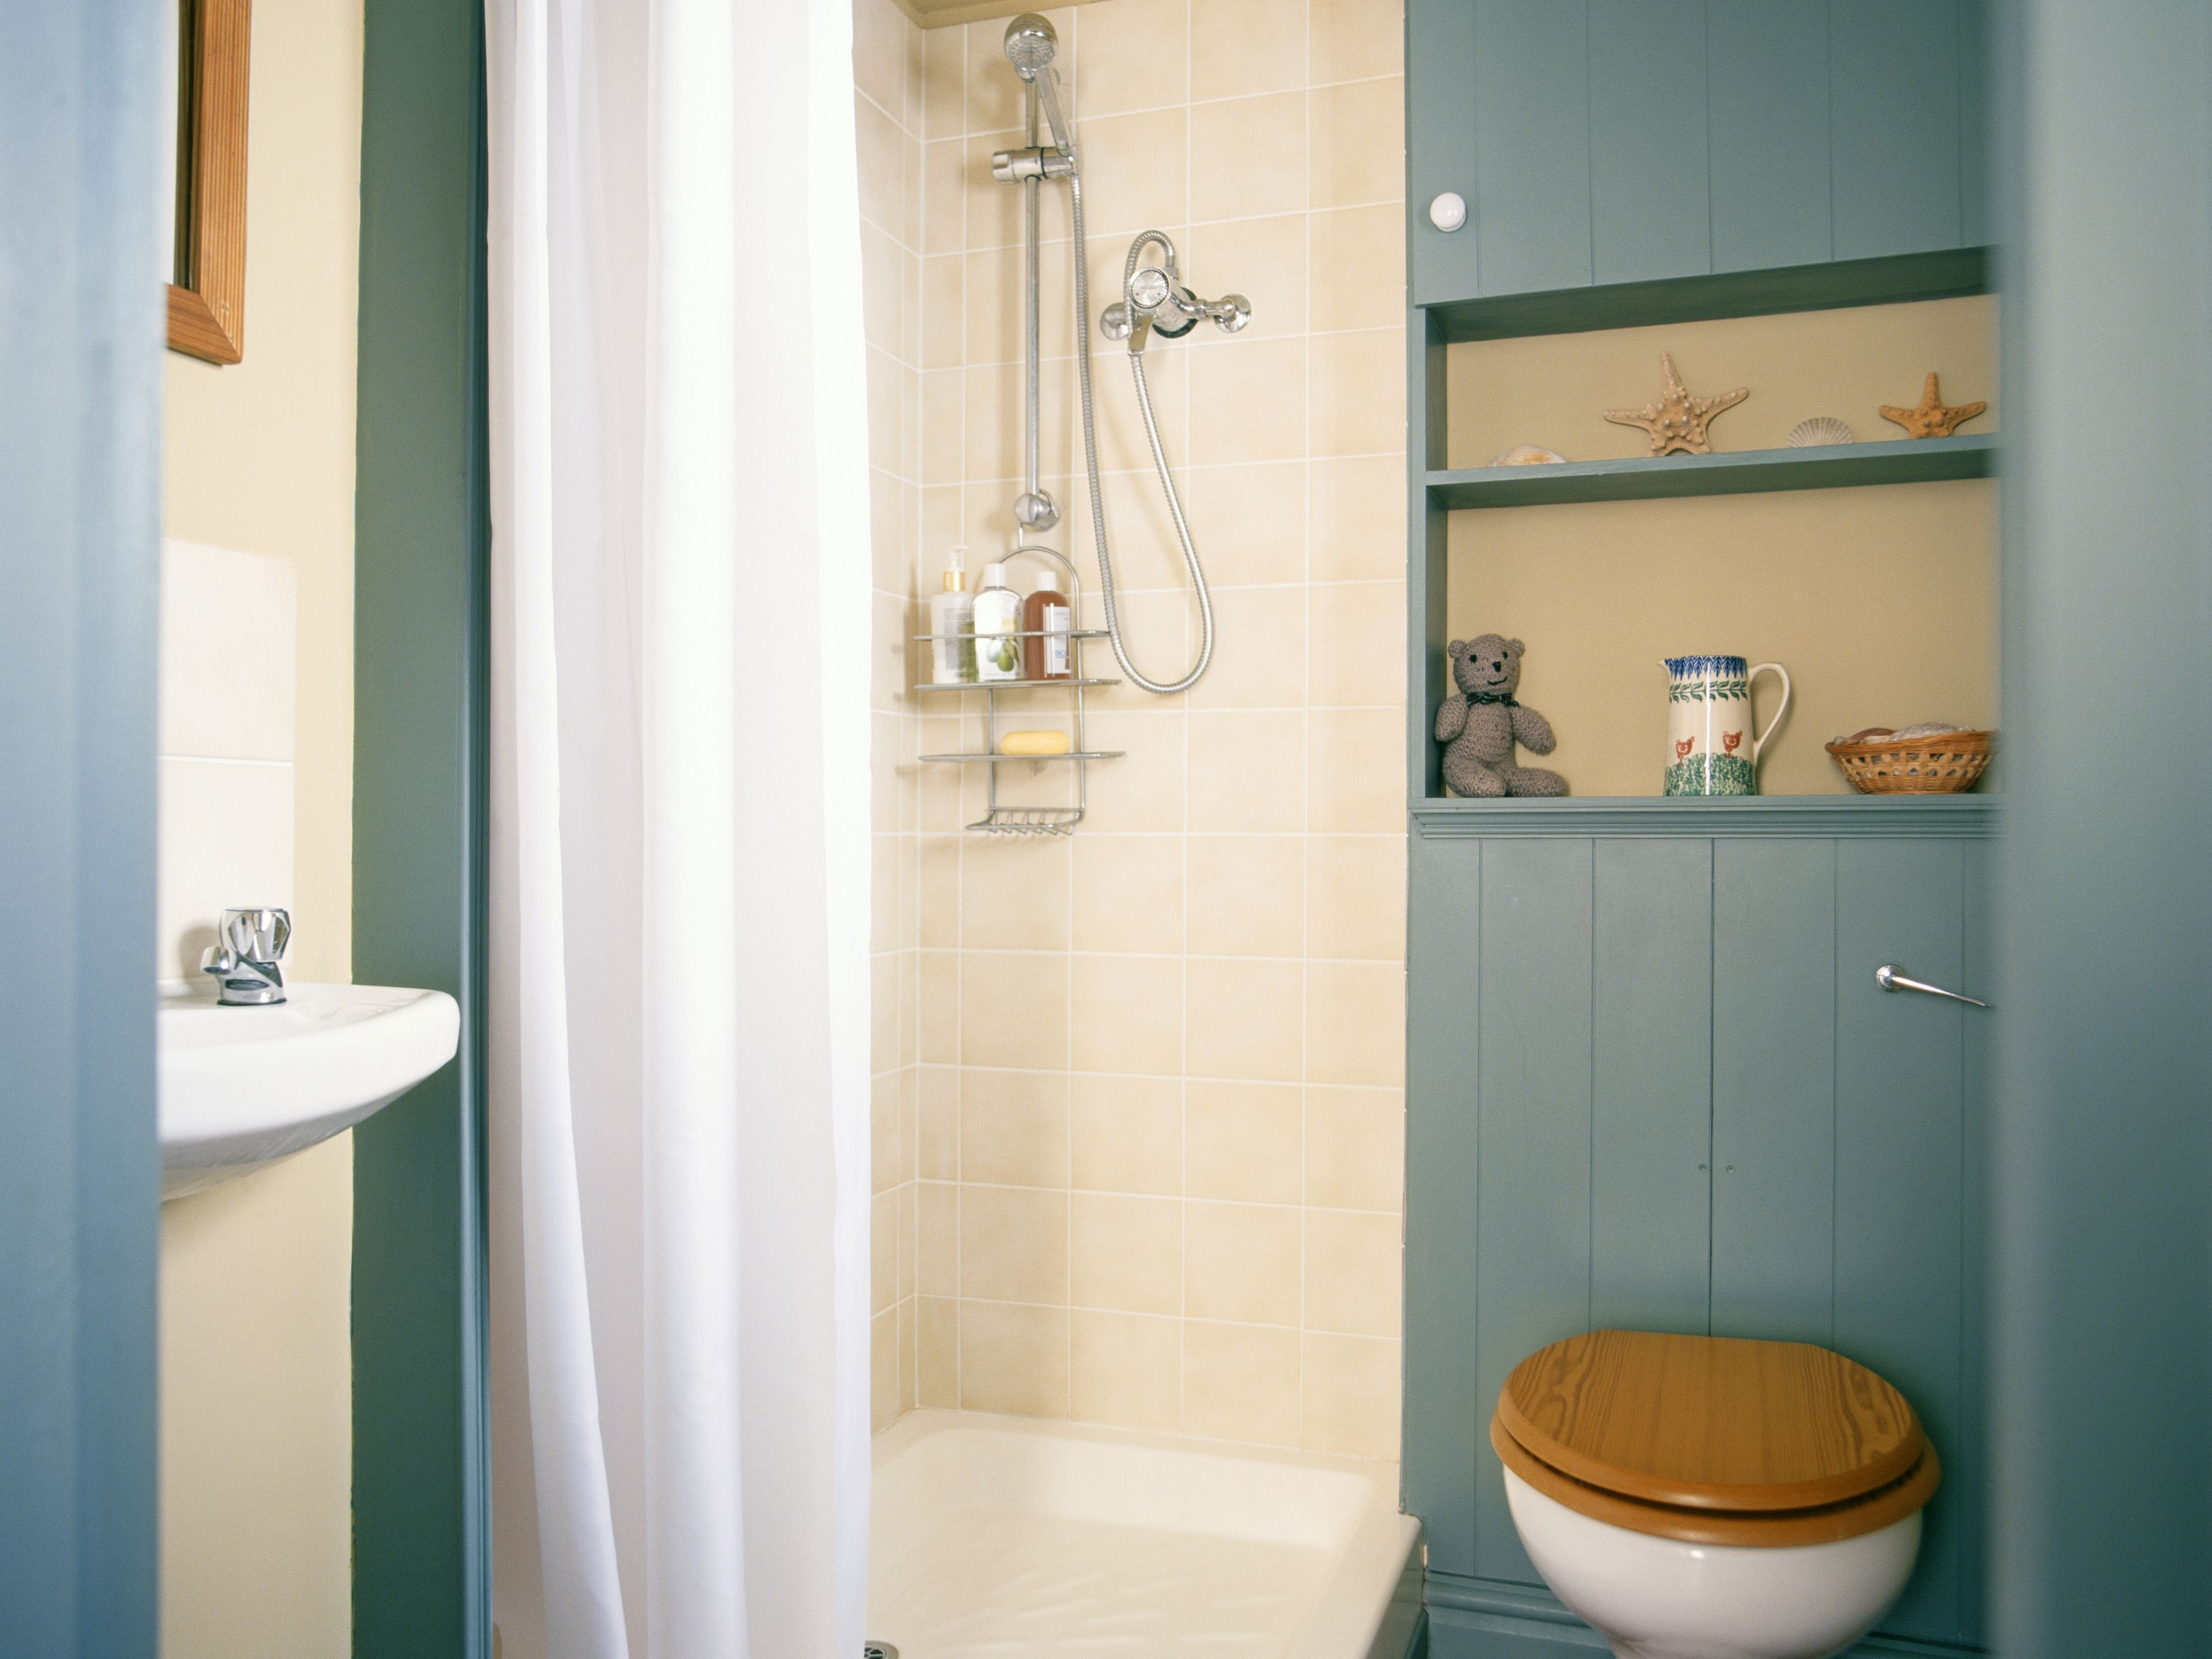 Fitting Pvc Bathroom Wall Panels Check More At Http Www Homeplans Club 2019 07 26 Fitting Pvc B Bathroom Wall Panels Home Depot Bathroom Acrylic Shower Walls